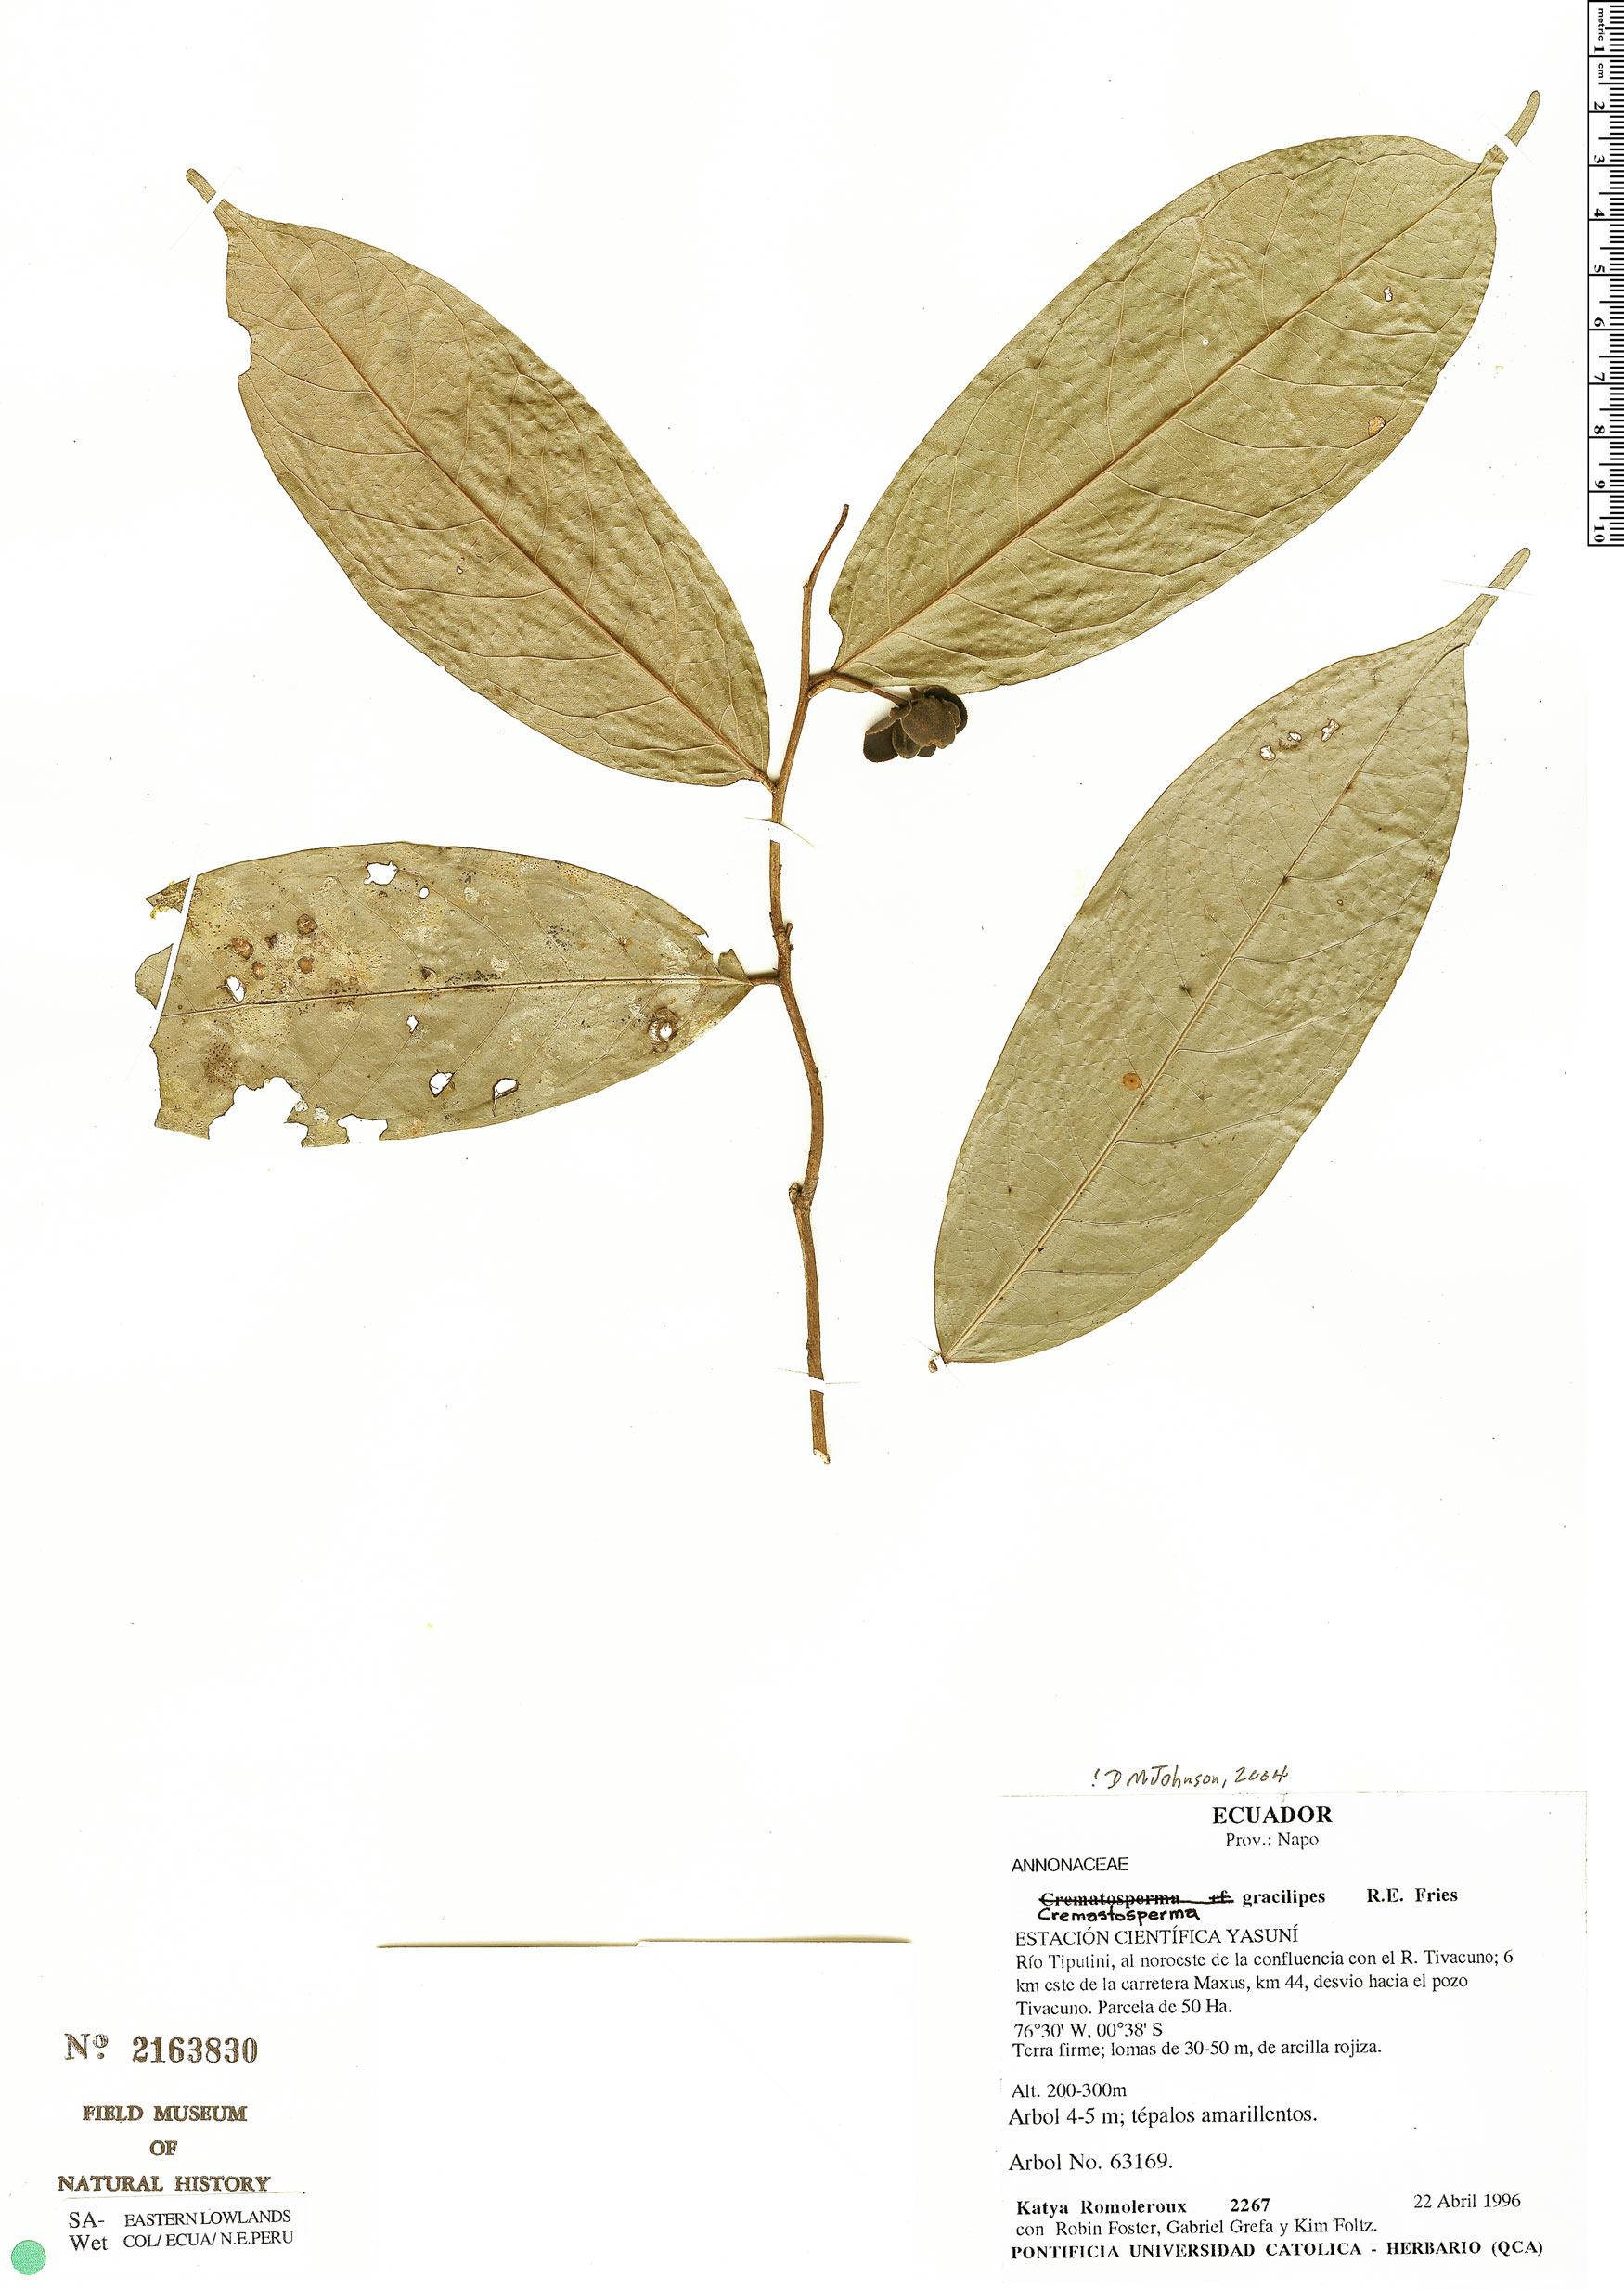 Espécime: Cremastosperma gracilipes